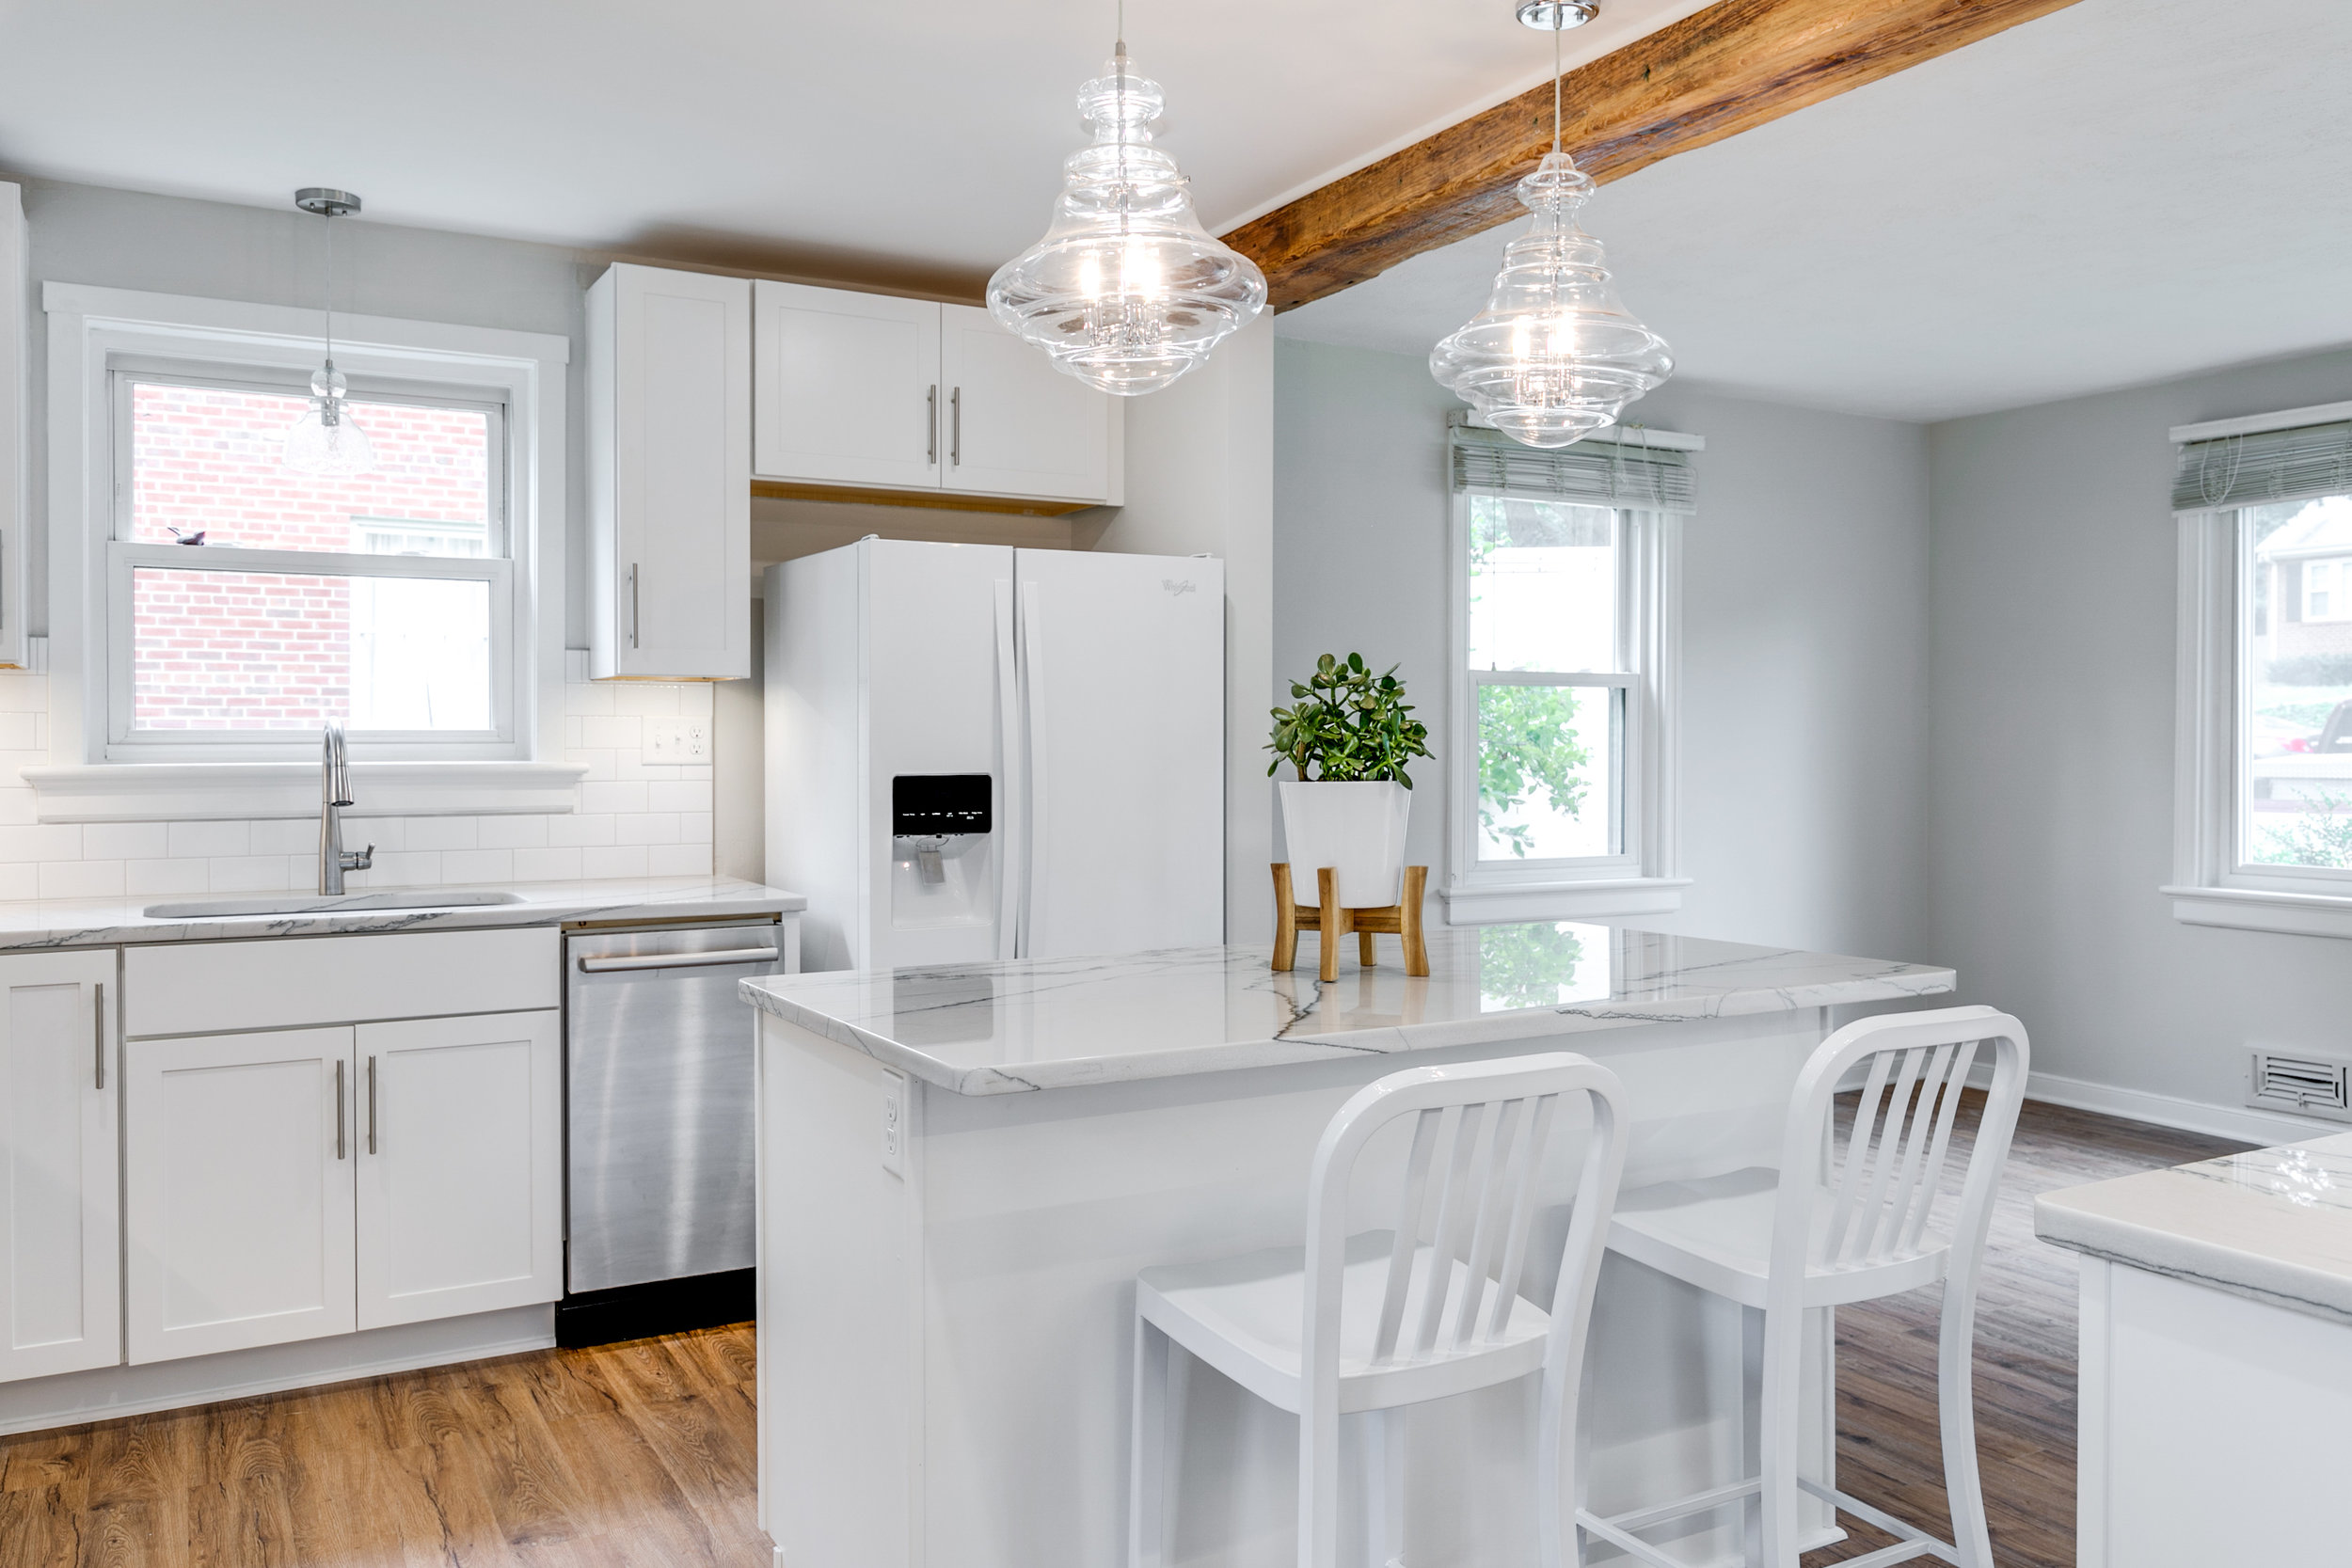 1406 Coronet Drive Kitchen (21 of 40).jpg